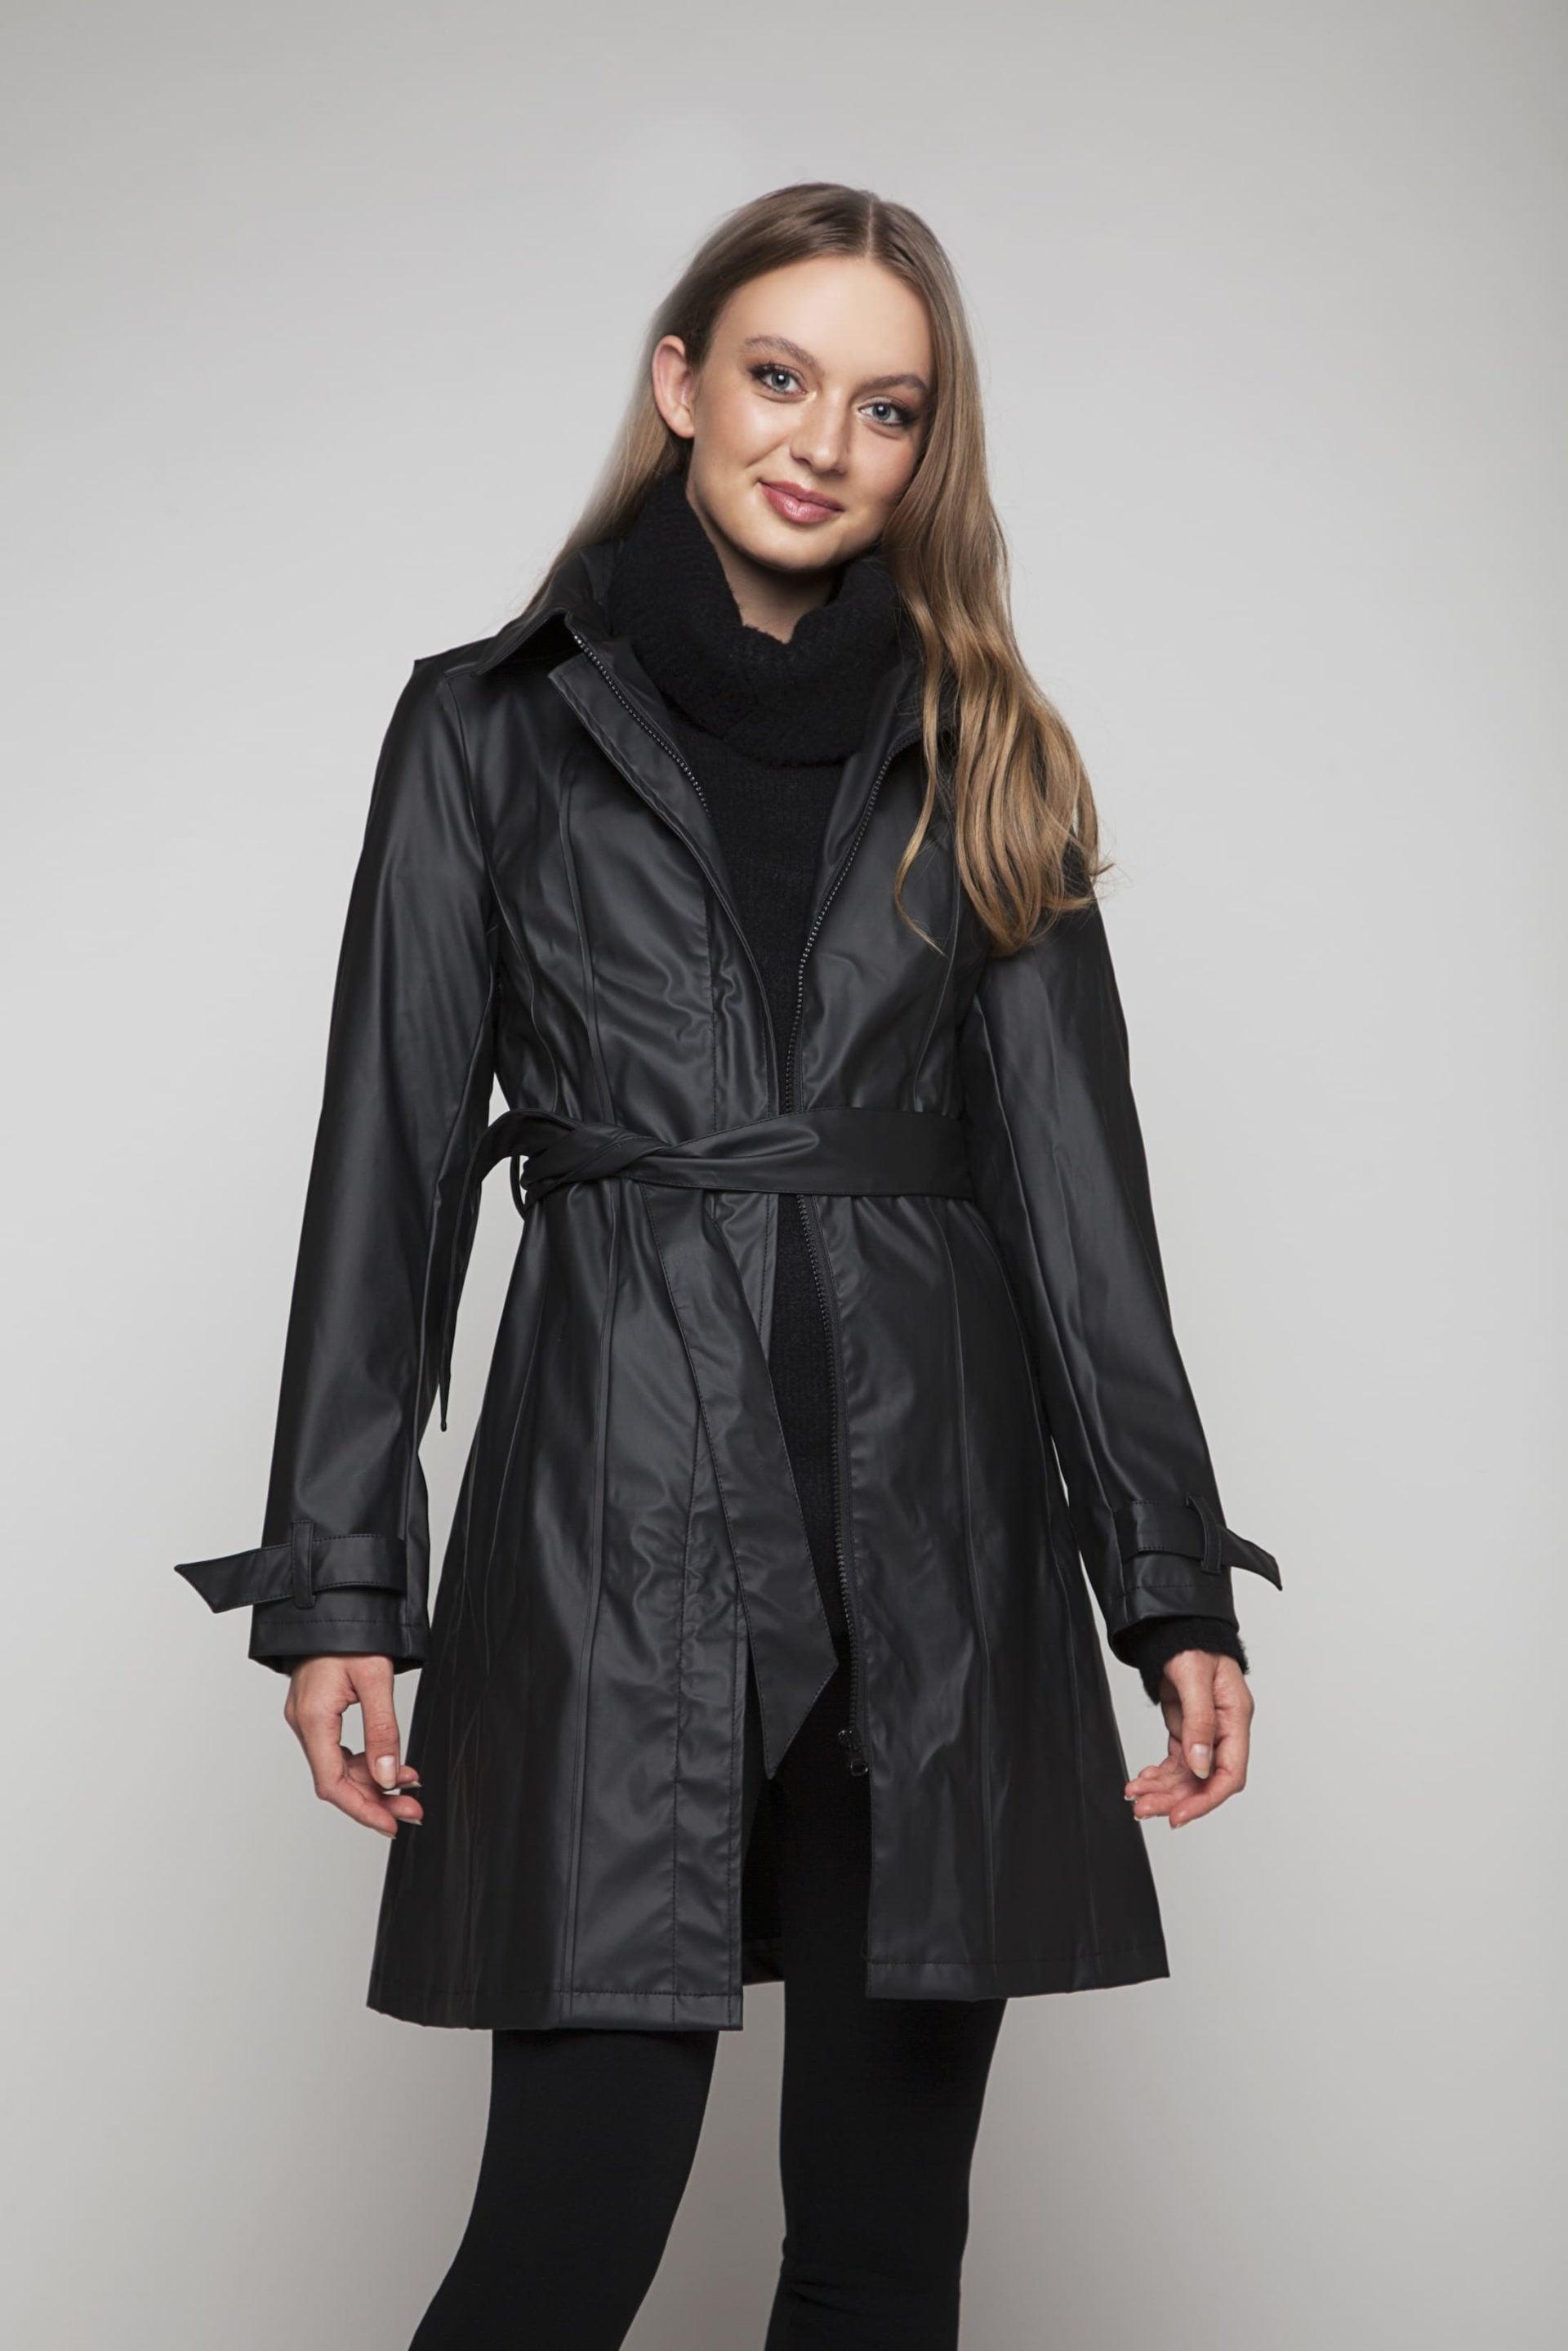 Classic trenchcoat style rainjacket